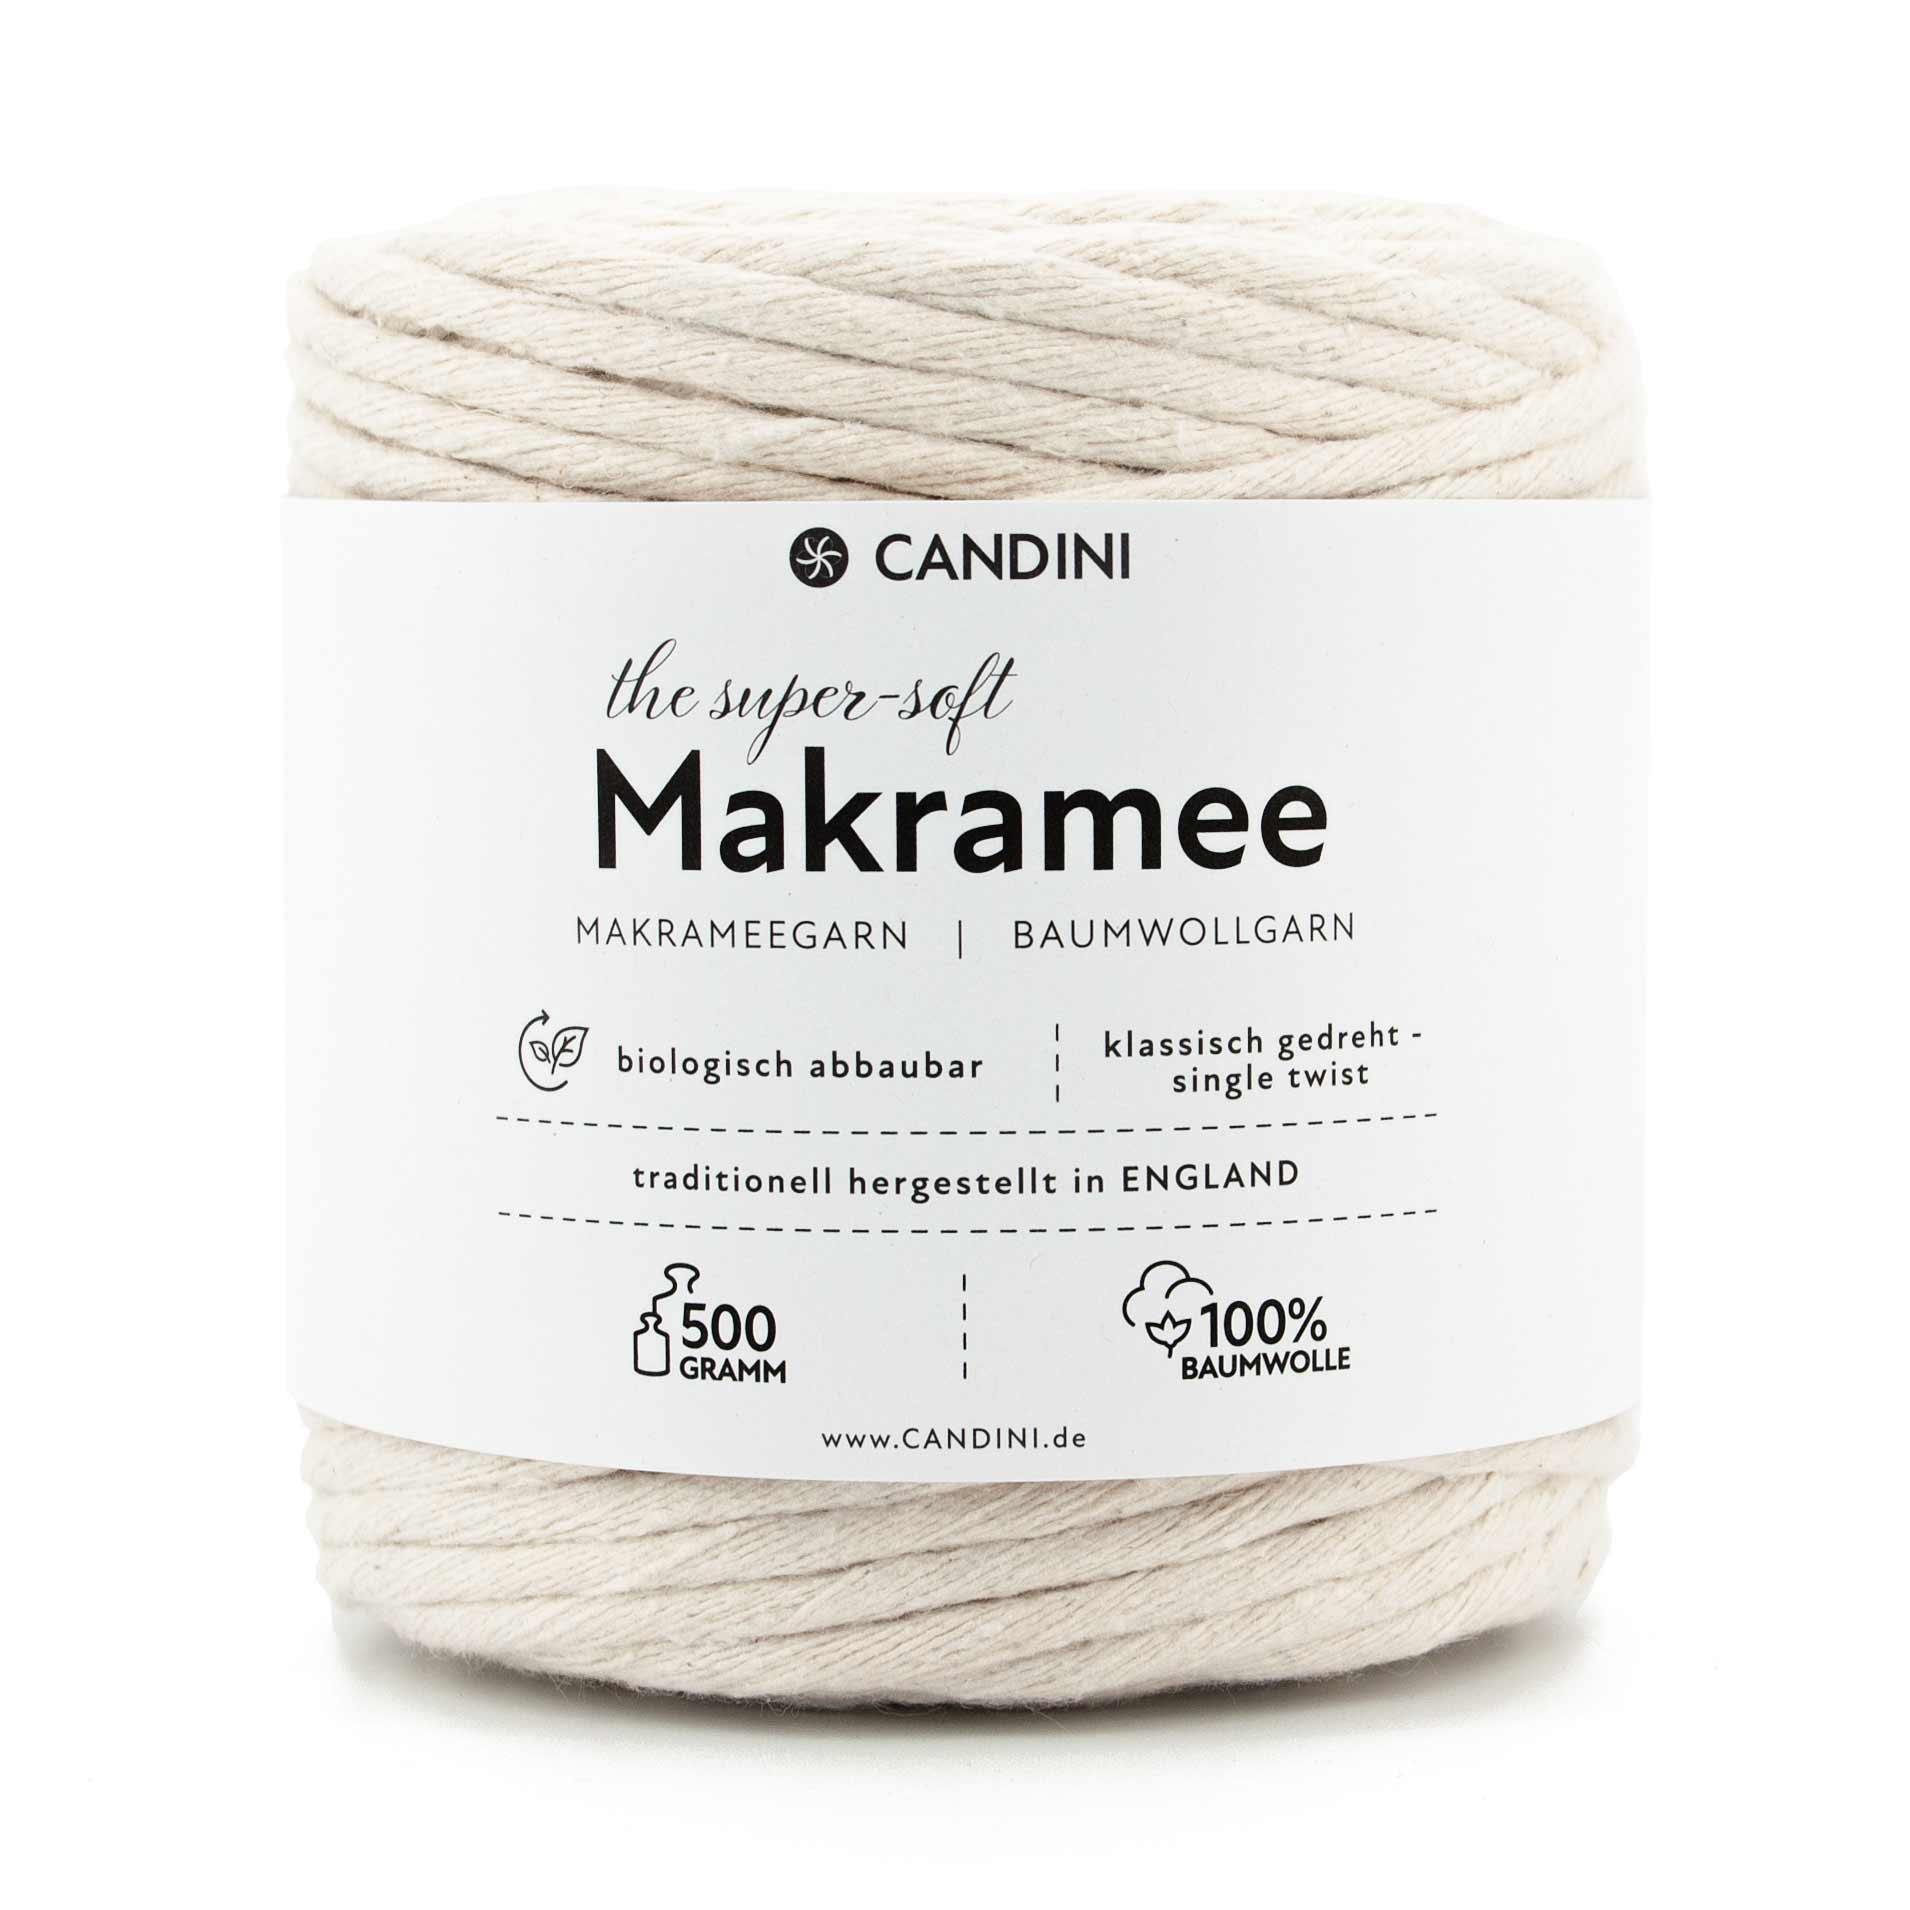 makramee-natur-27-3-500g_banderole